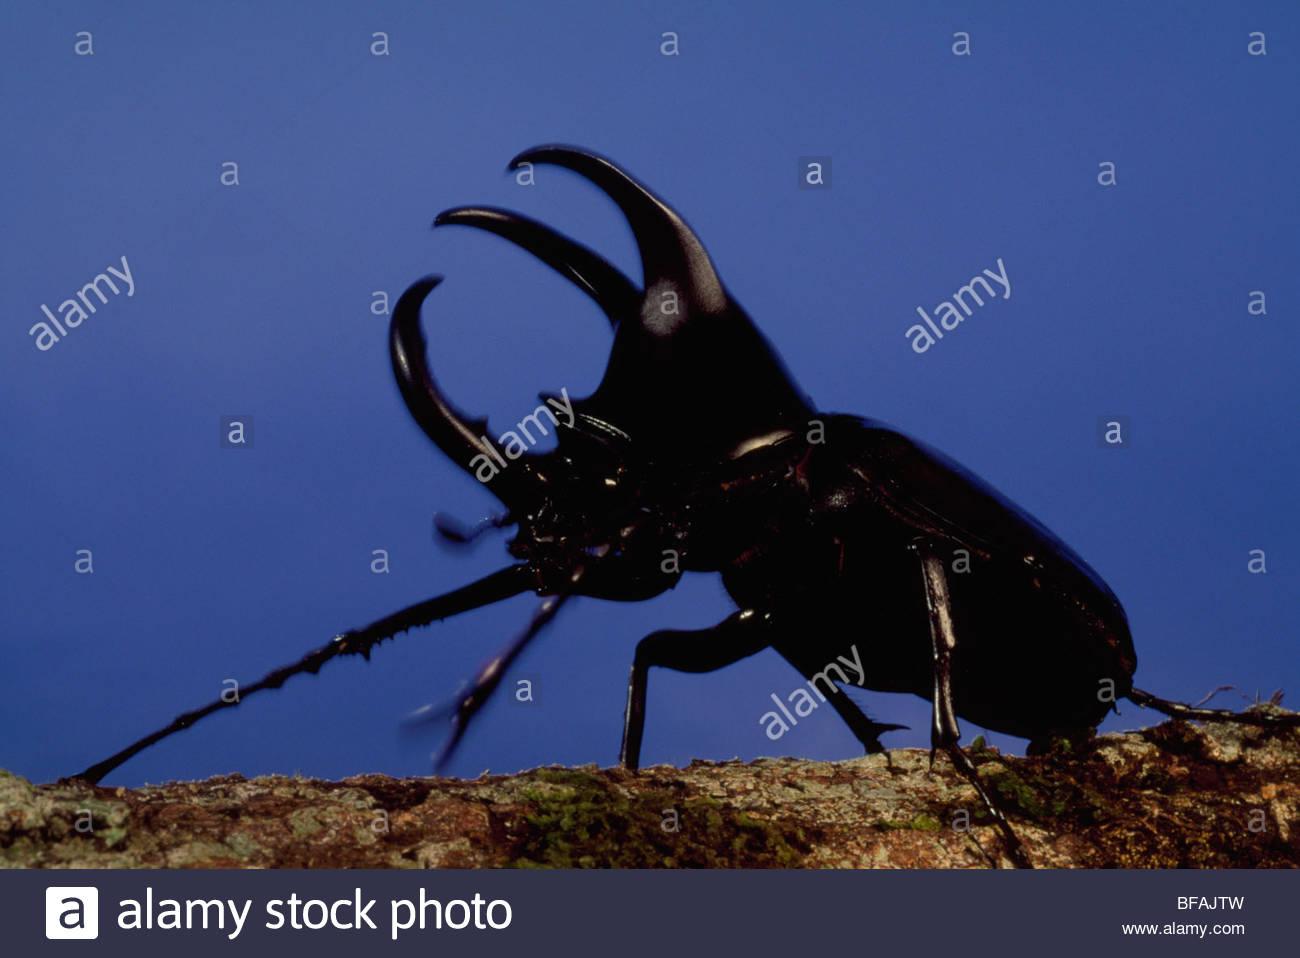 Rhinoceros beetle male, Dynastinae subfamily, Borneo - Stock Image